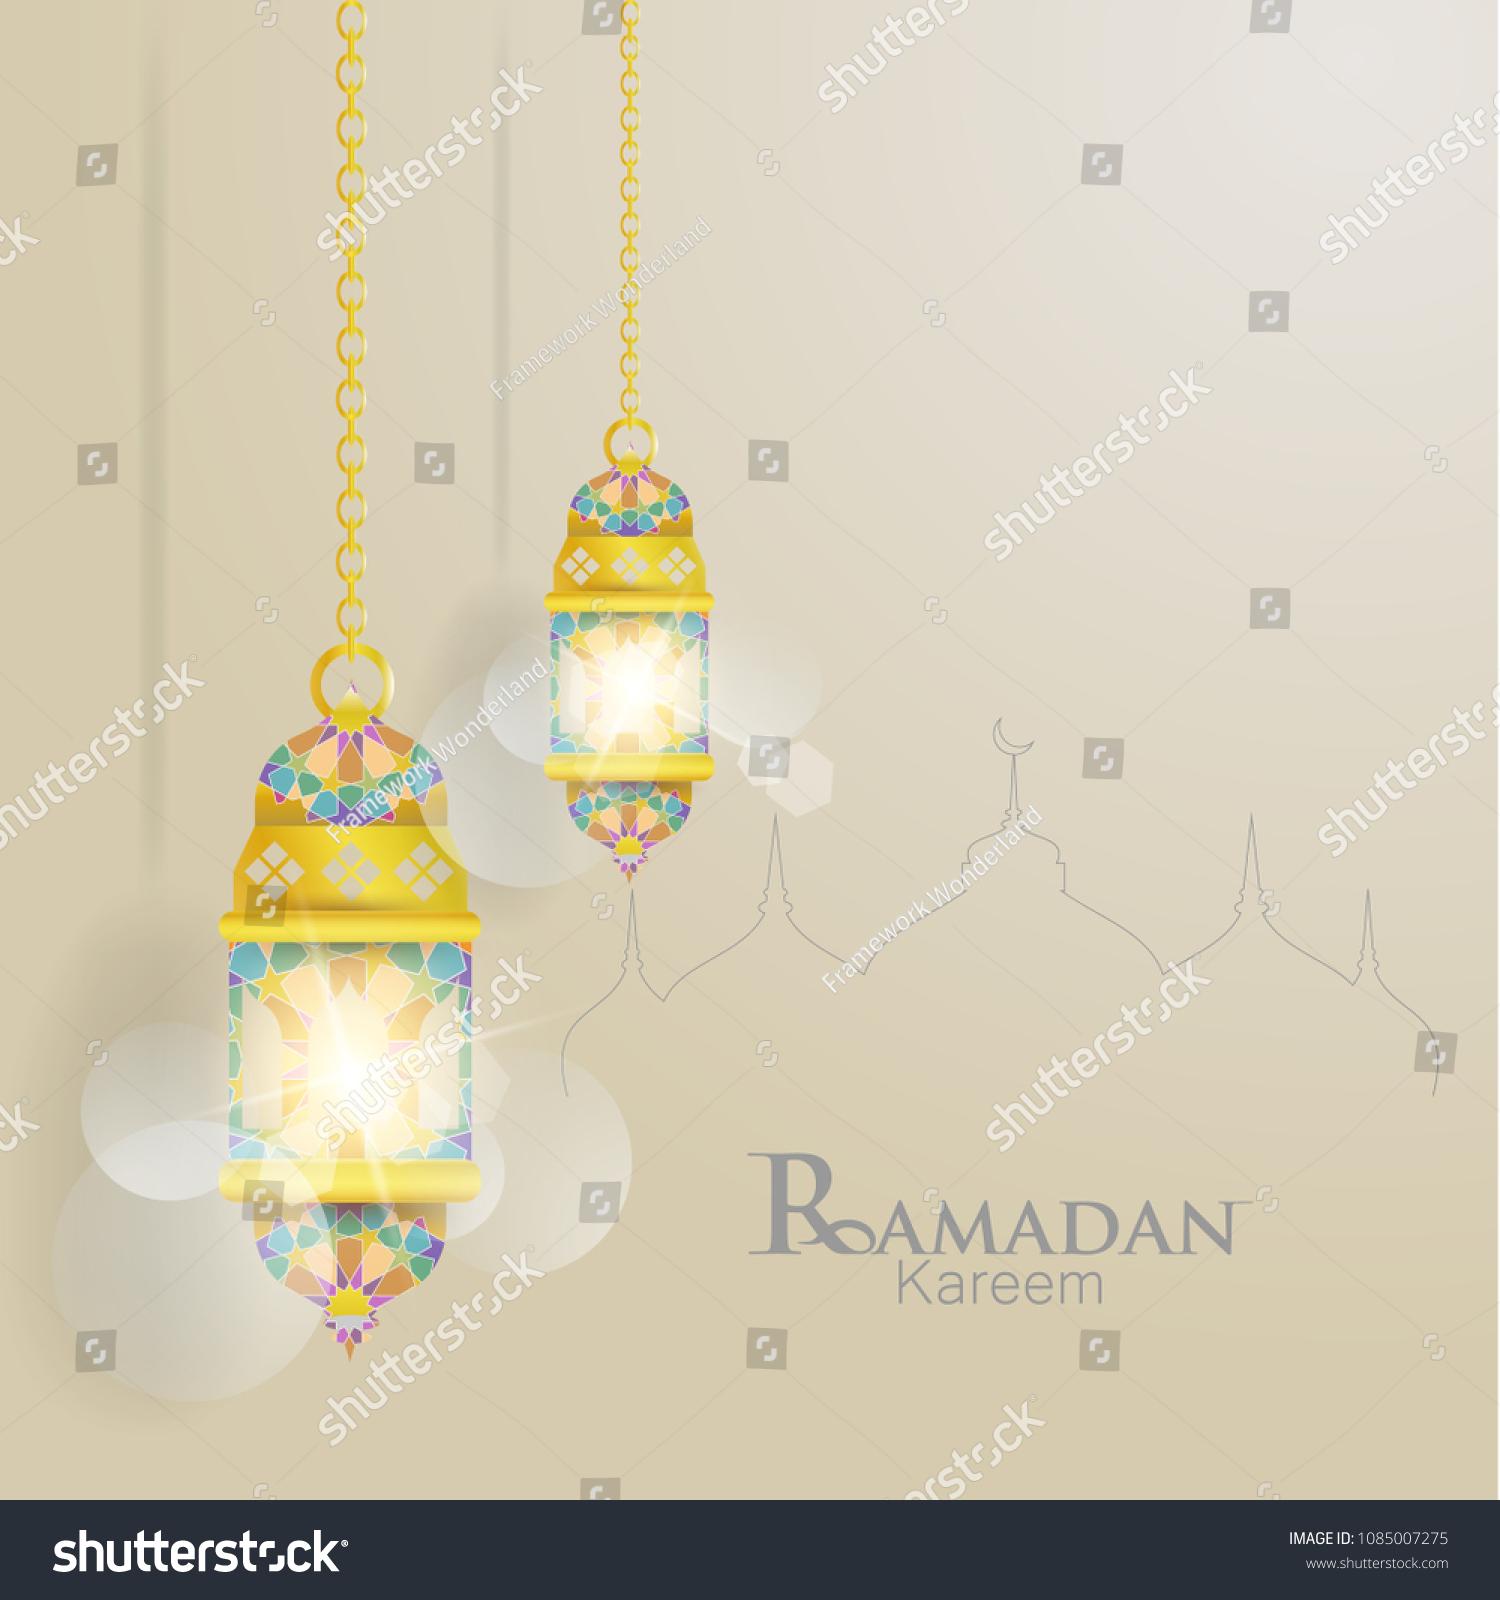 Ramadan Kareem Illustrations Lanterns Greeting Cards Stock Vector